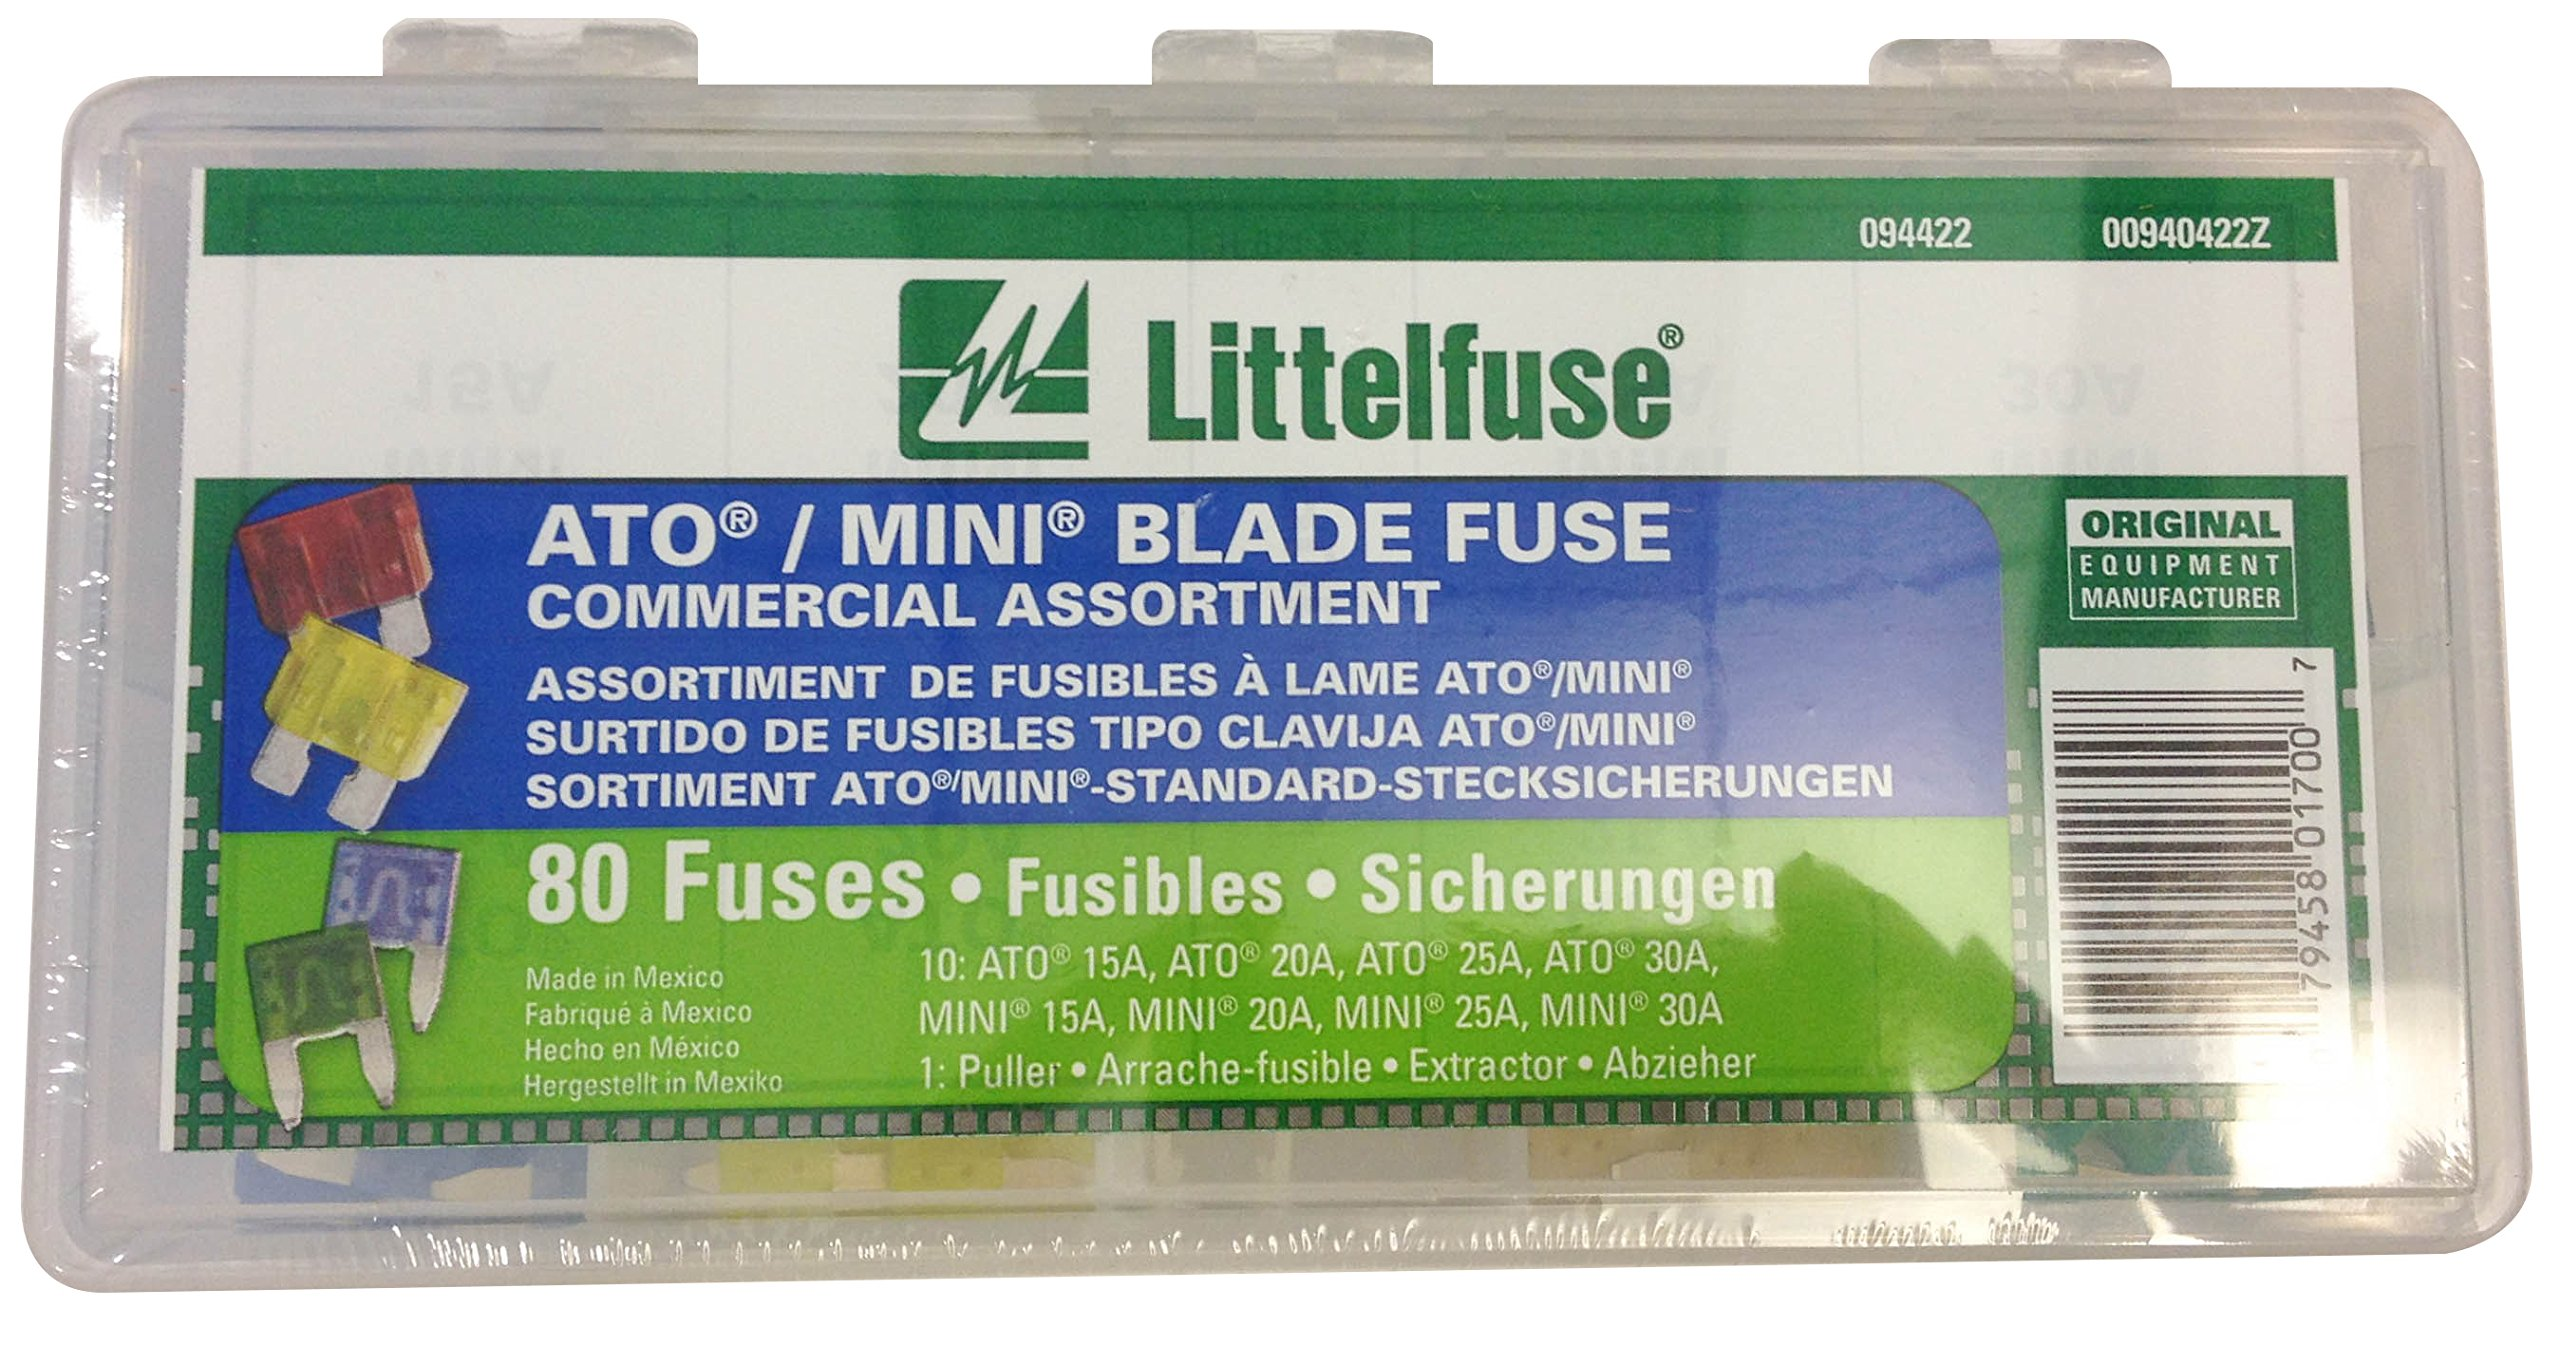 Littelfuse 94422 ATO/MINI Blade Fuse Kit - 80 Piece